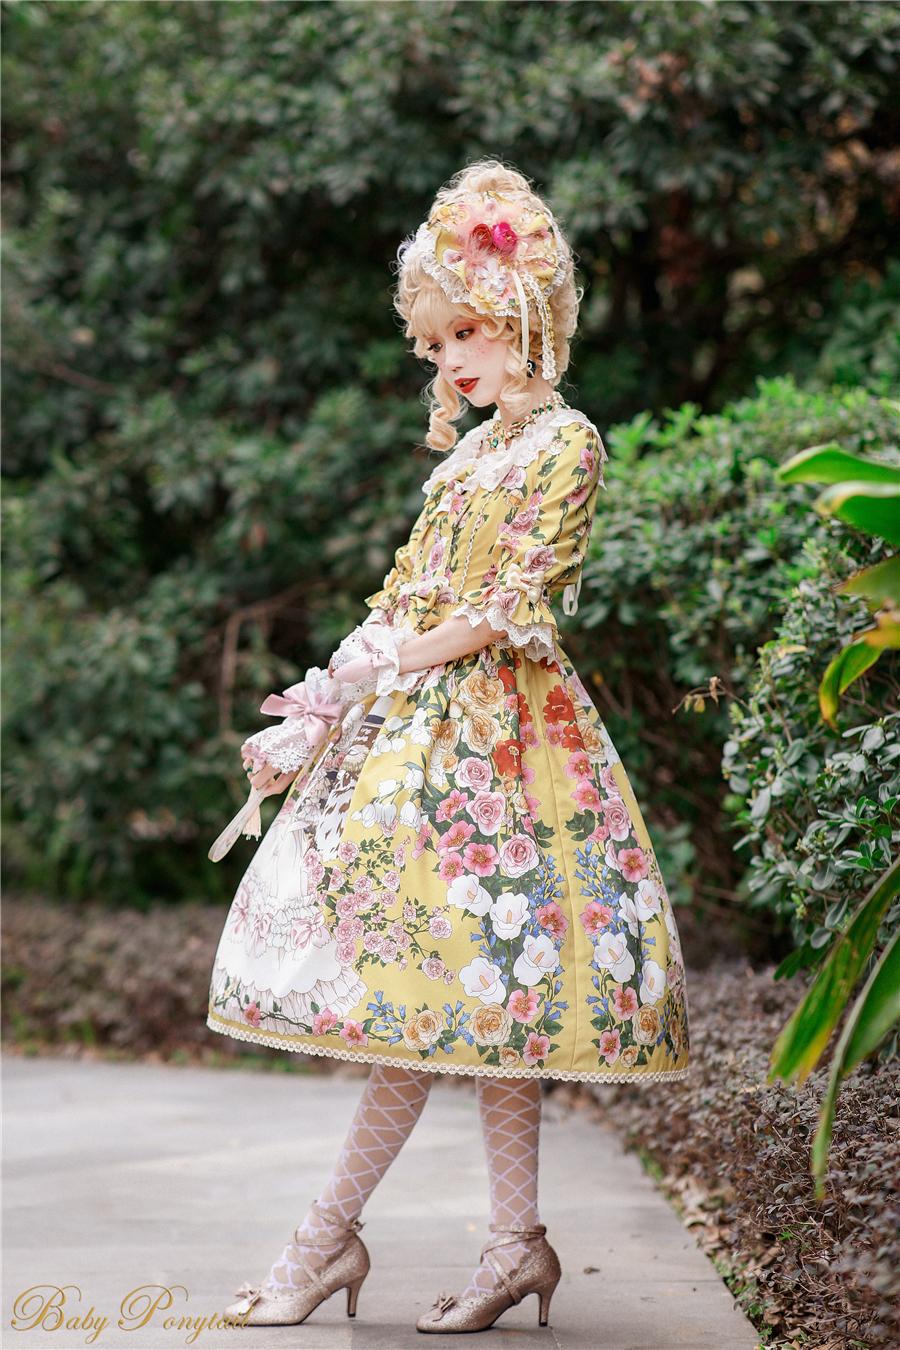 Baby Ponytail_Model Photo_Polly's Garden of Dreams_OP Yellow_Kaka_23.jpg